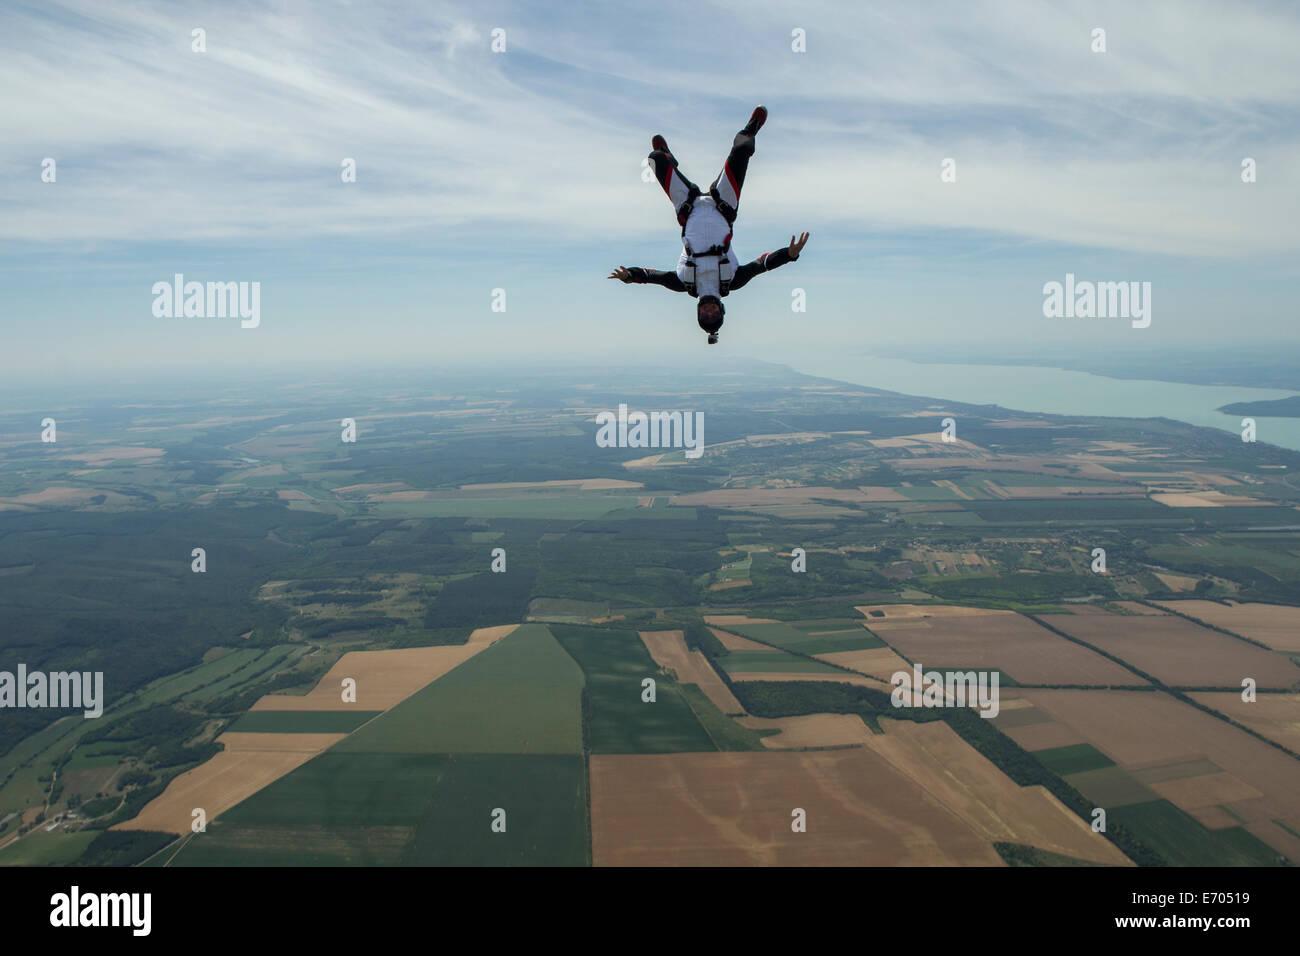 Paracaidista freeflying masculino boca abajo encima de Somogy Siofok, Hungría Imagen De Stock